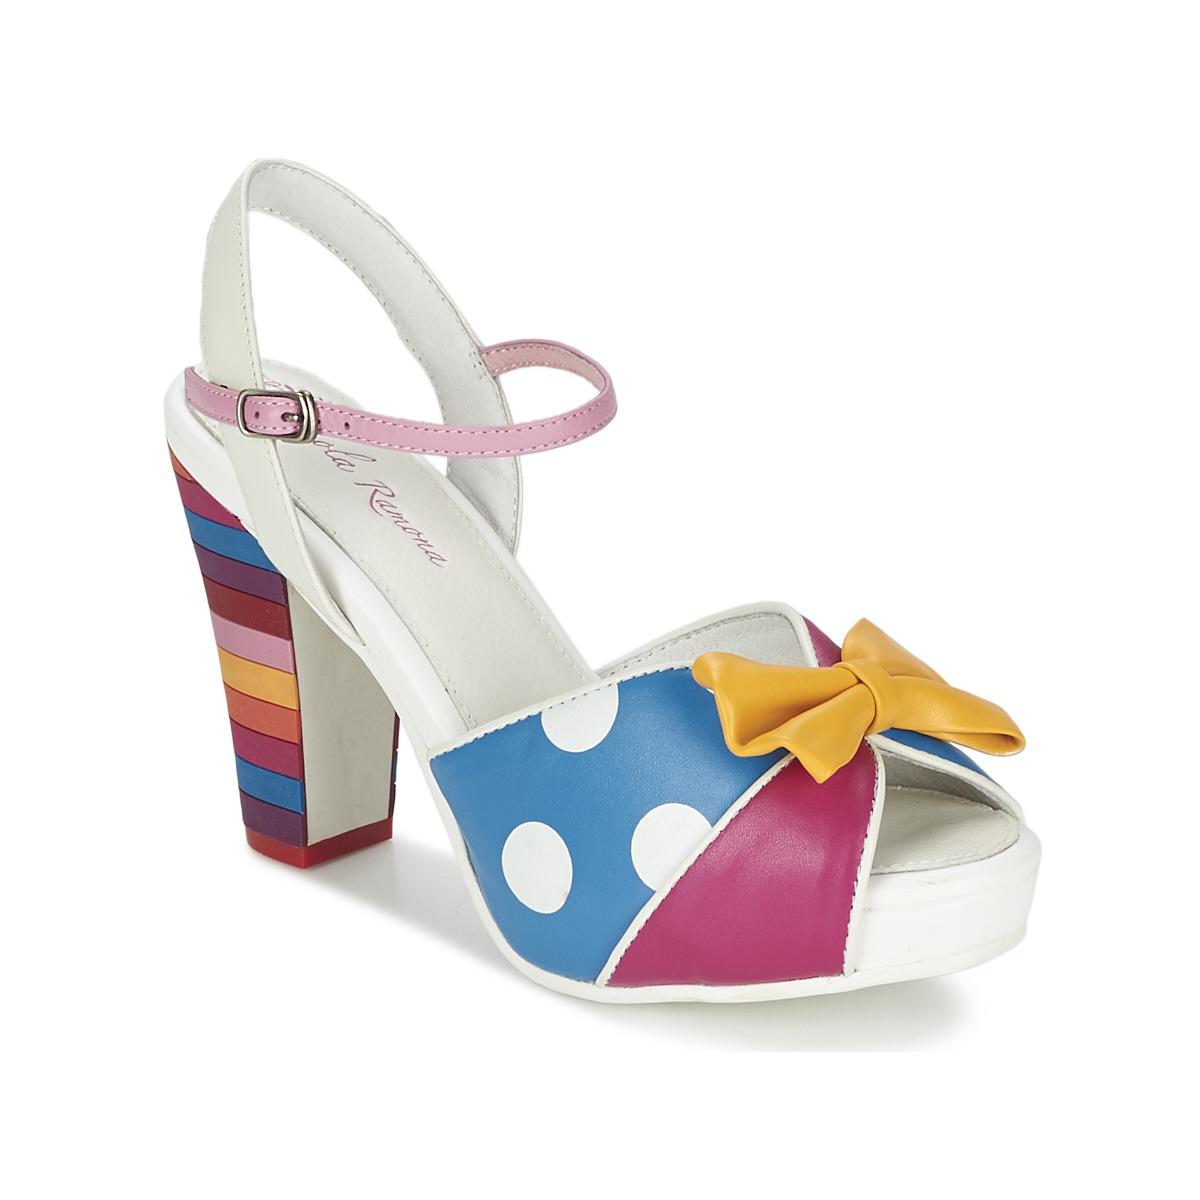 Sandale Lola Ramona ANGIE P Multicolore